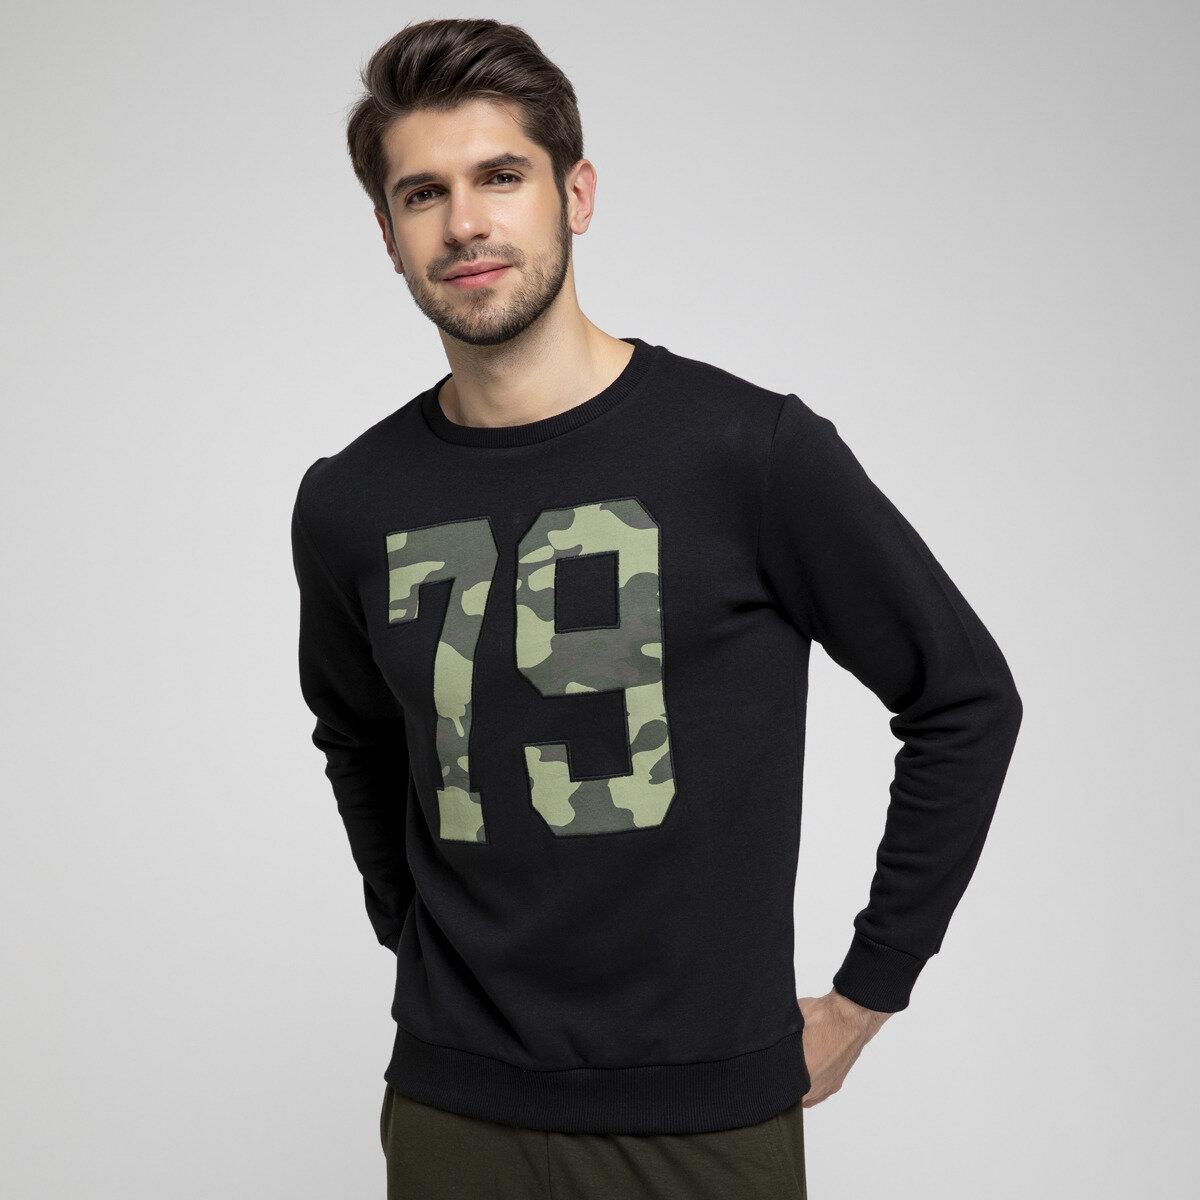 FLO THOR 2 SWEAT Black Men 'S Sweatshirt LUMBERJACK